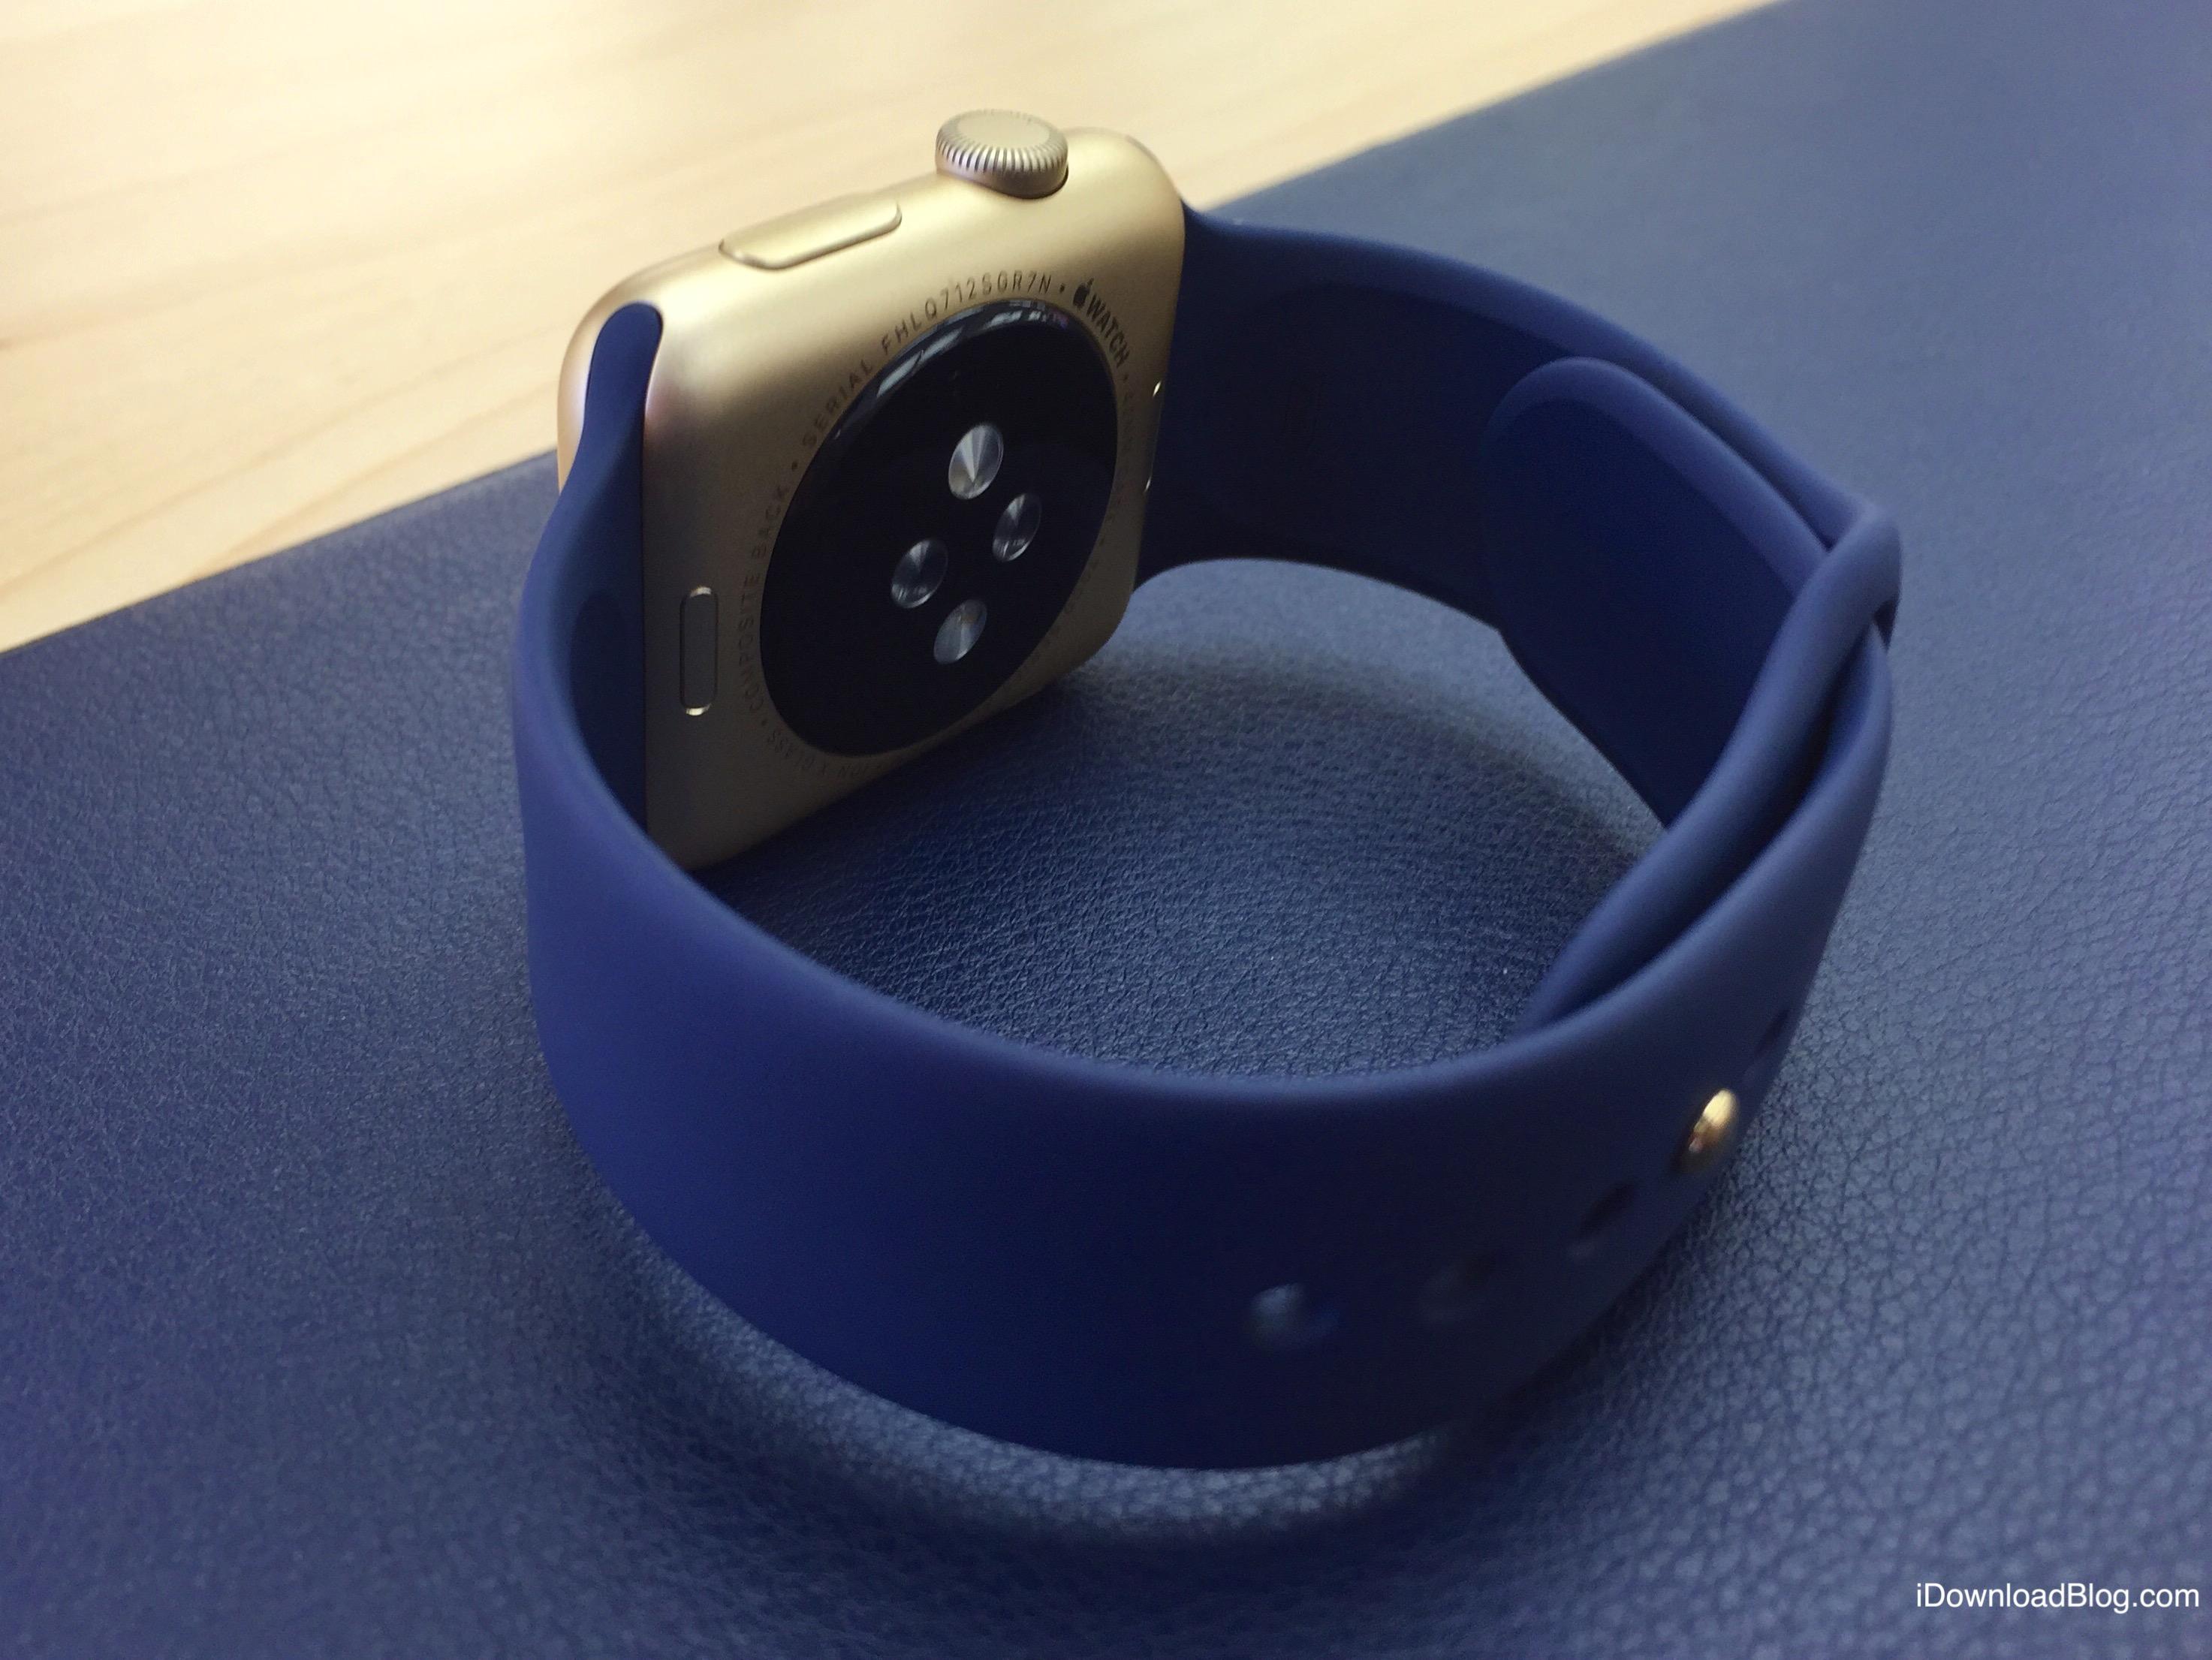 Gold Aluminum Apple Watch Hands on 1